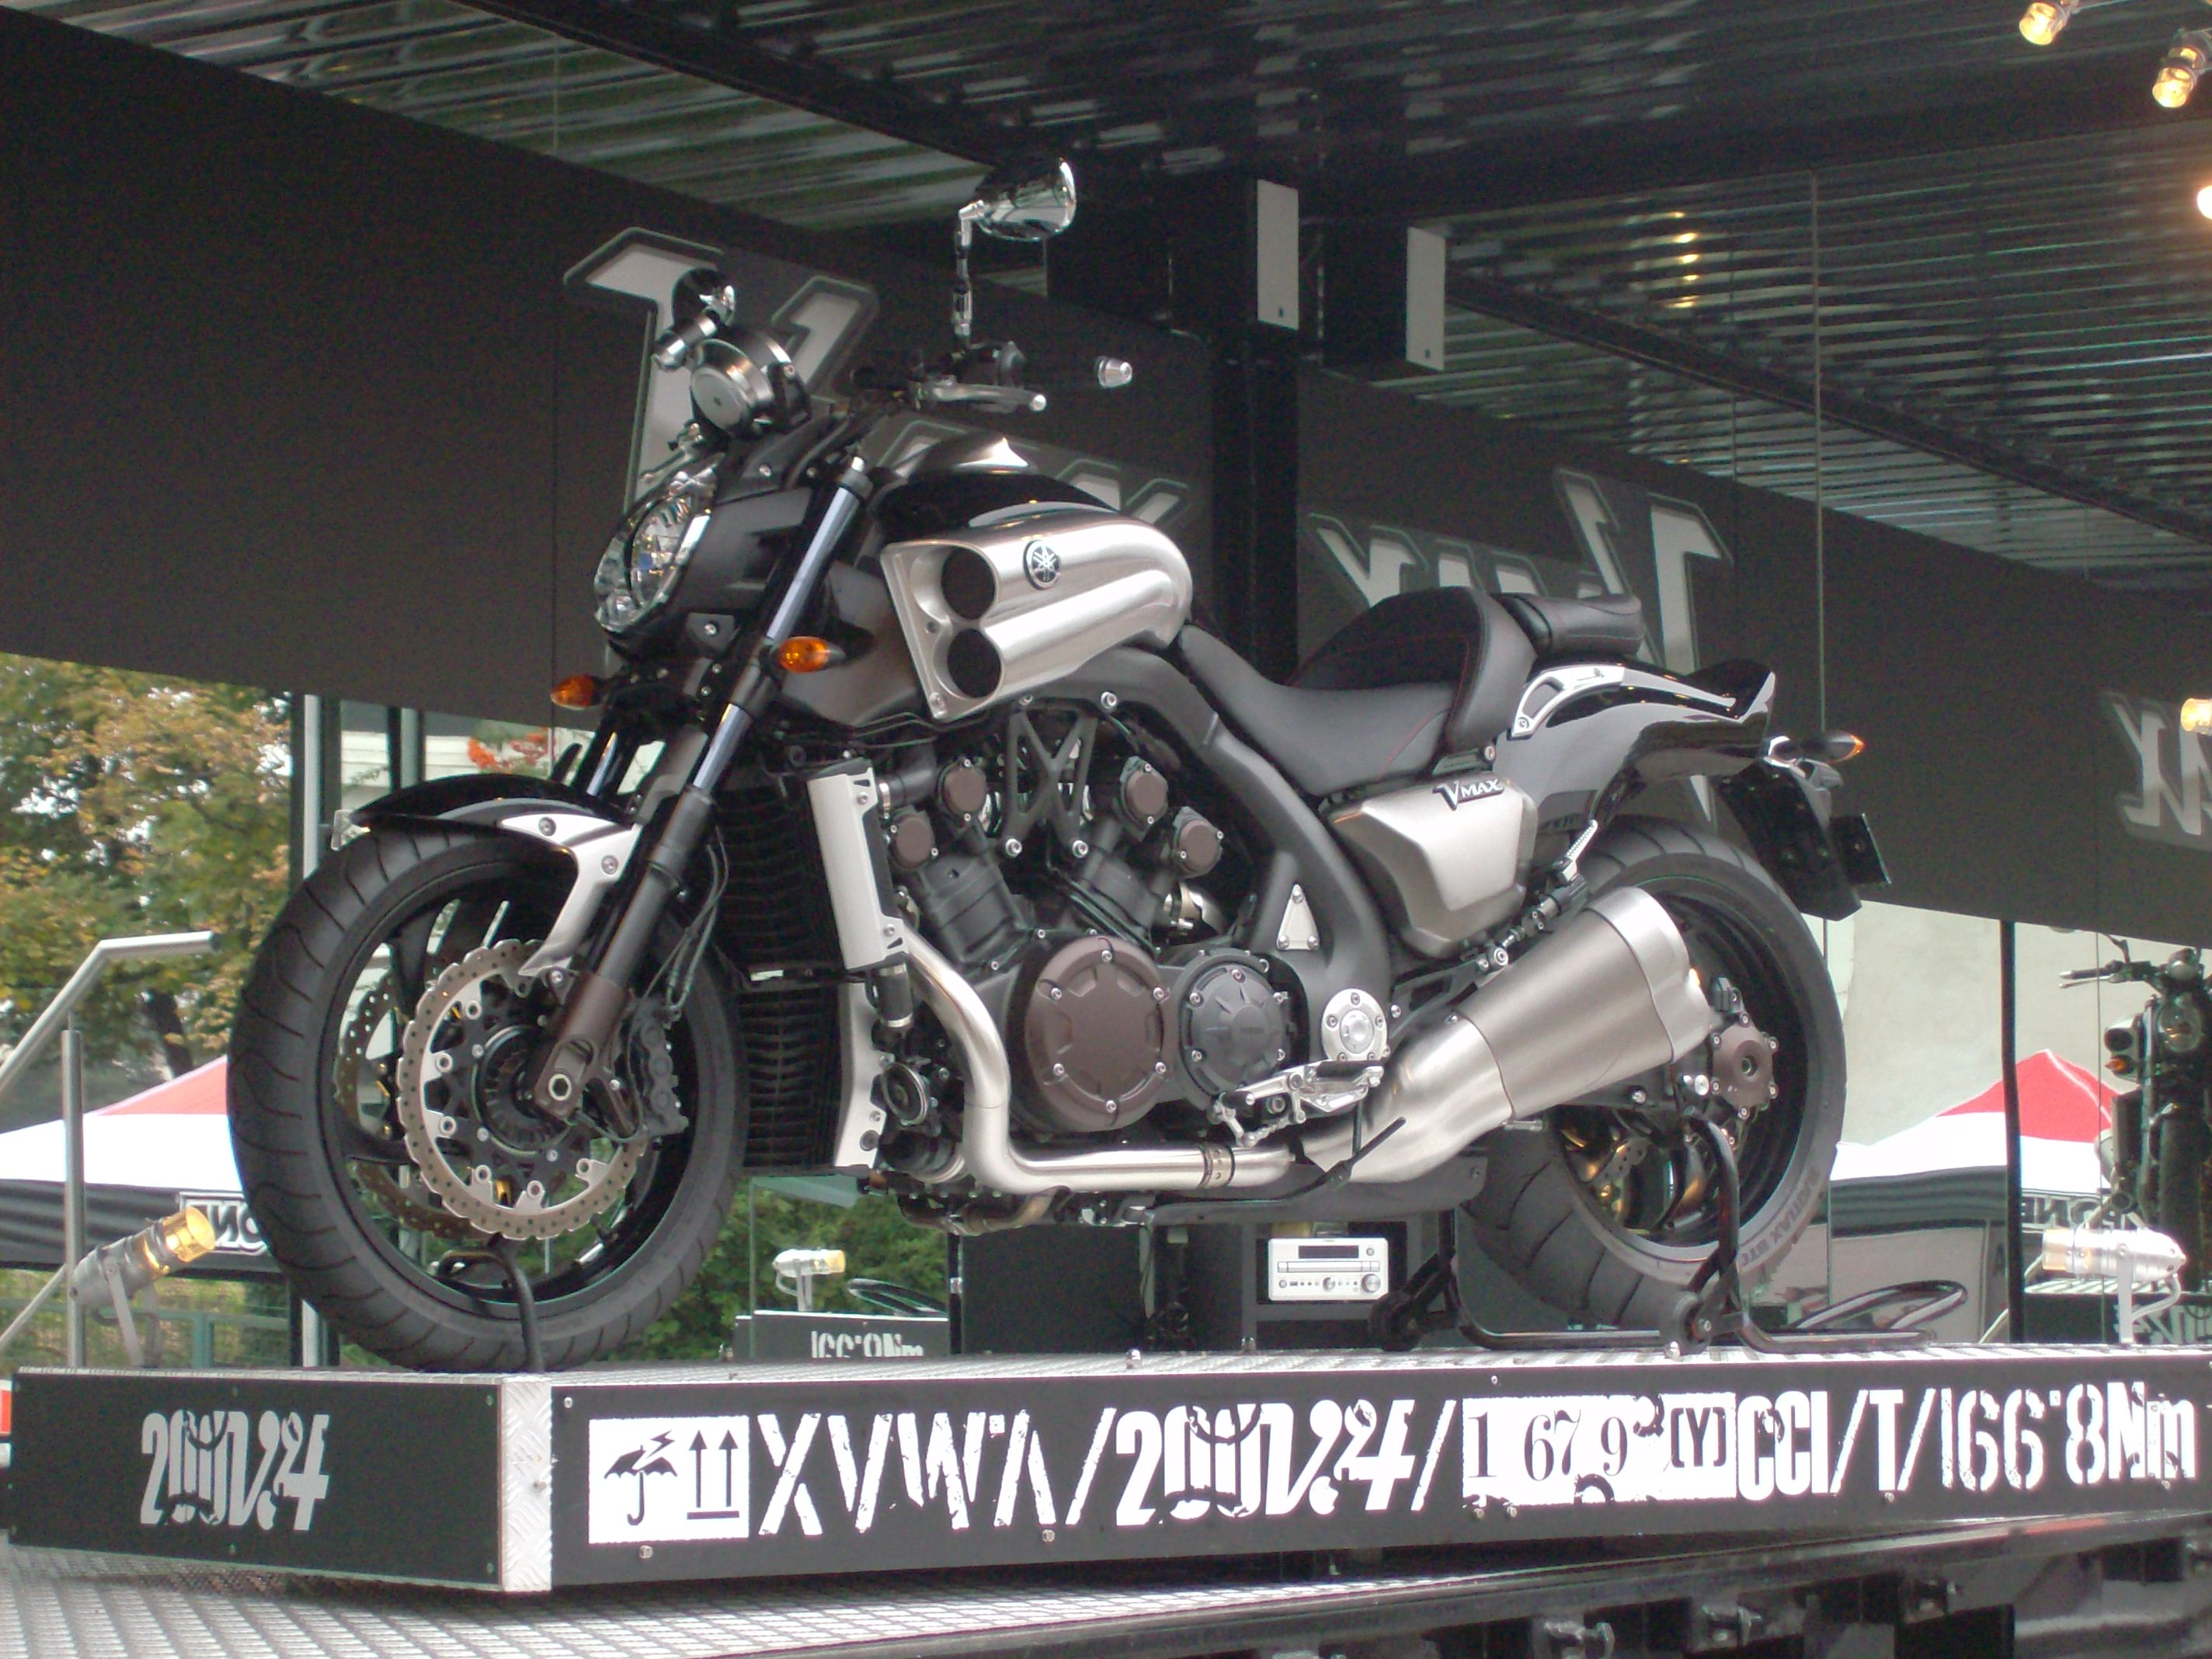 Yamaha Vmax With Corbin Hard Saddlebags